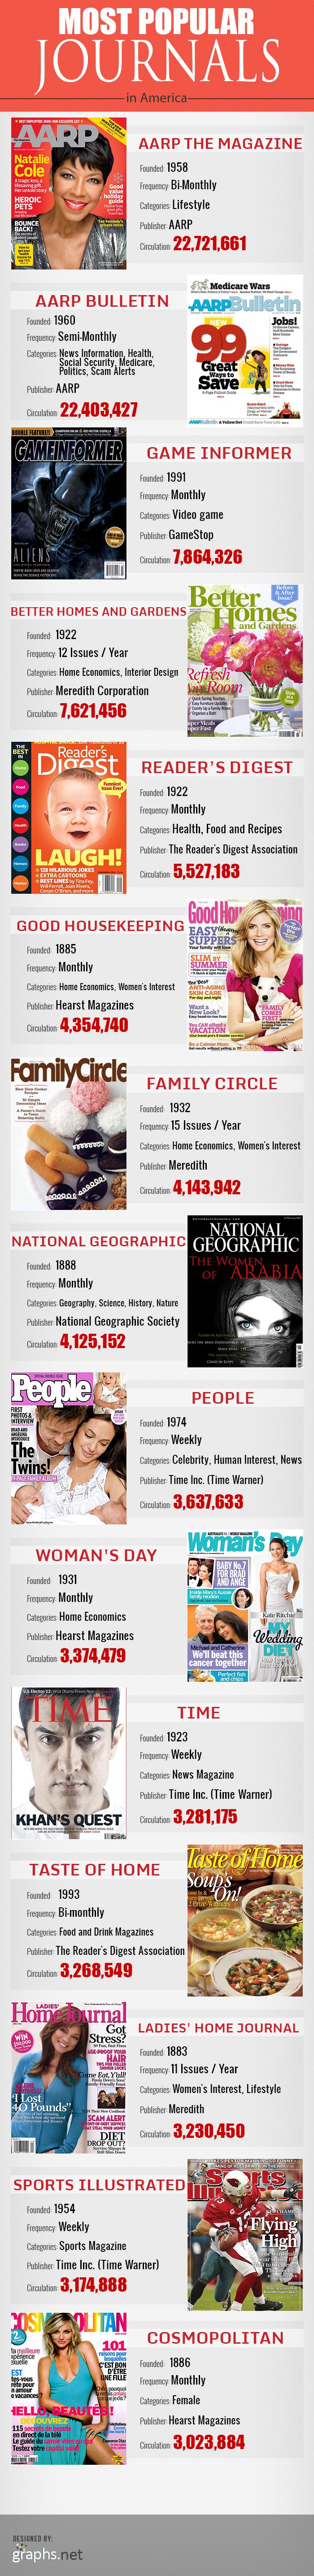 Most Popular Journals in America